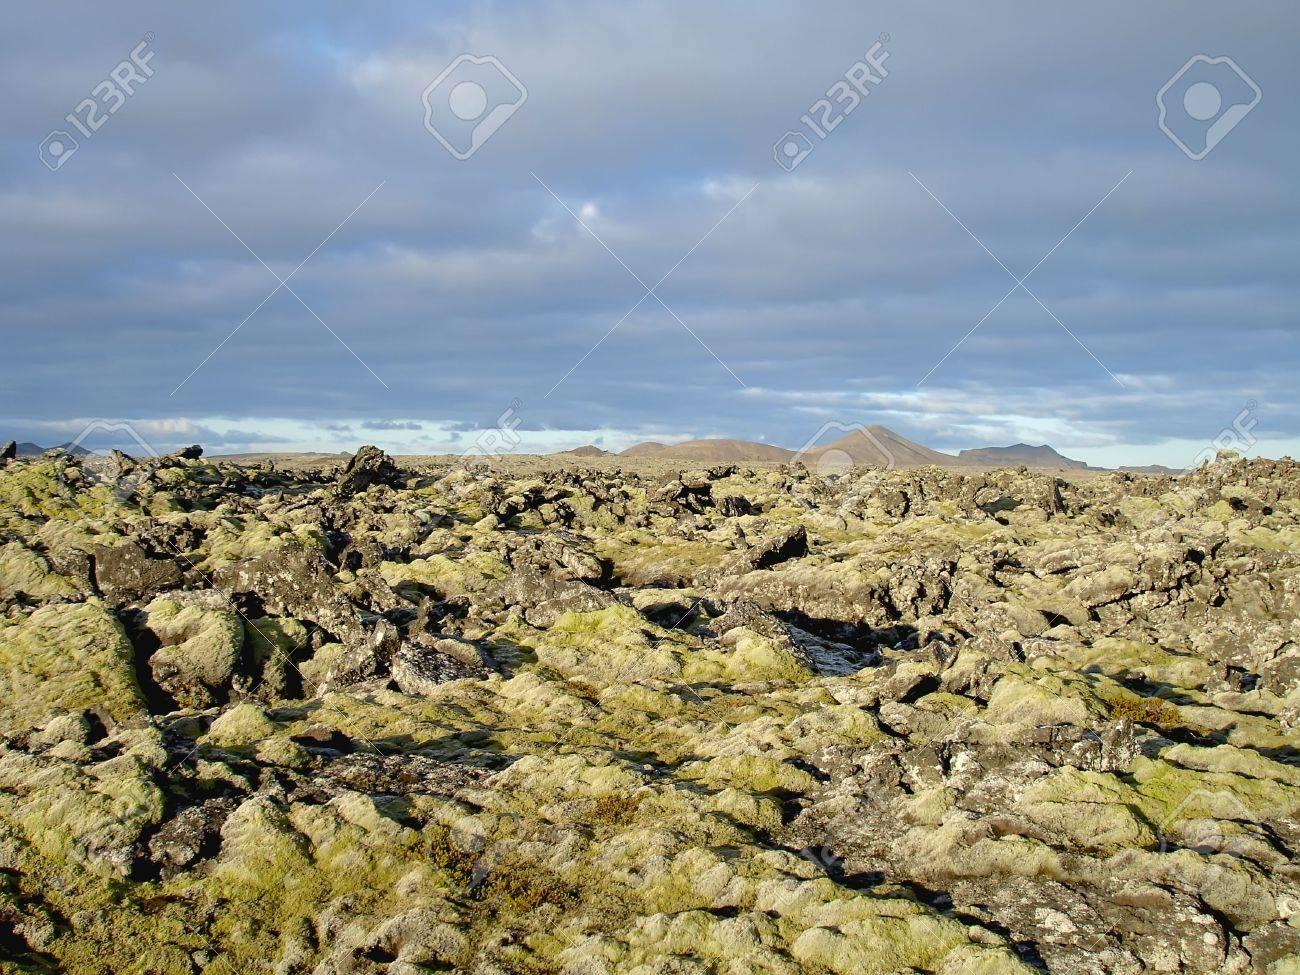 Extreme volcanic terrain in icelandic 'Blue Lagoon' area near Reykjavik. Stock Photo - 4572380